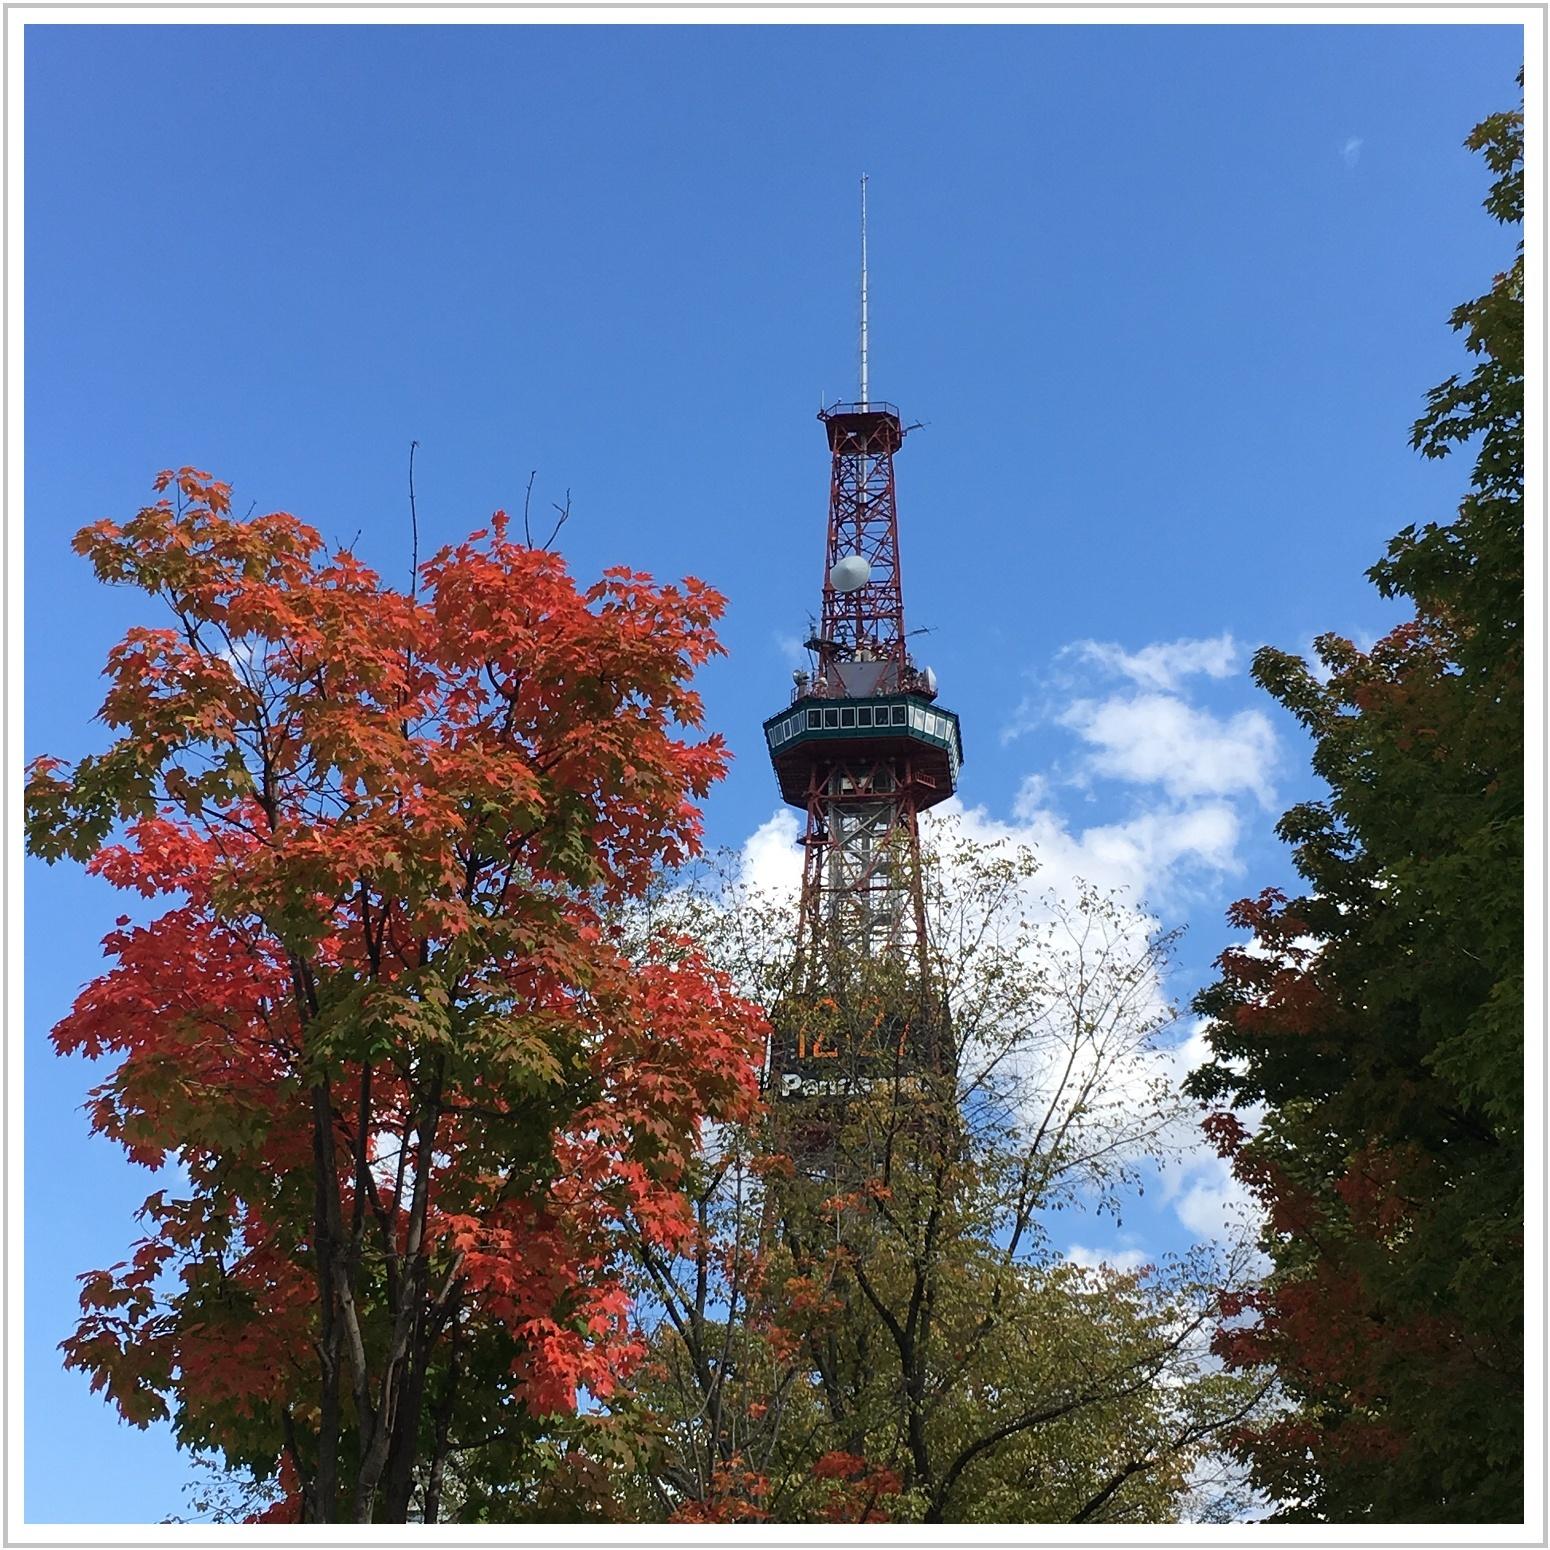 tower_1_926.jpg